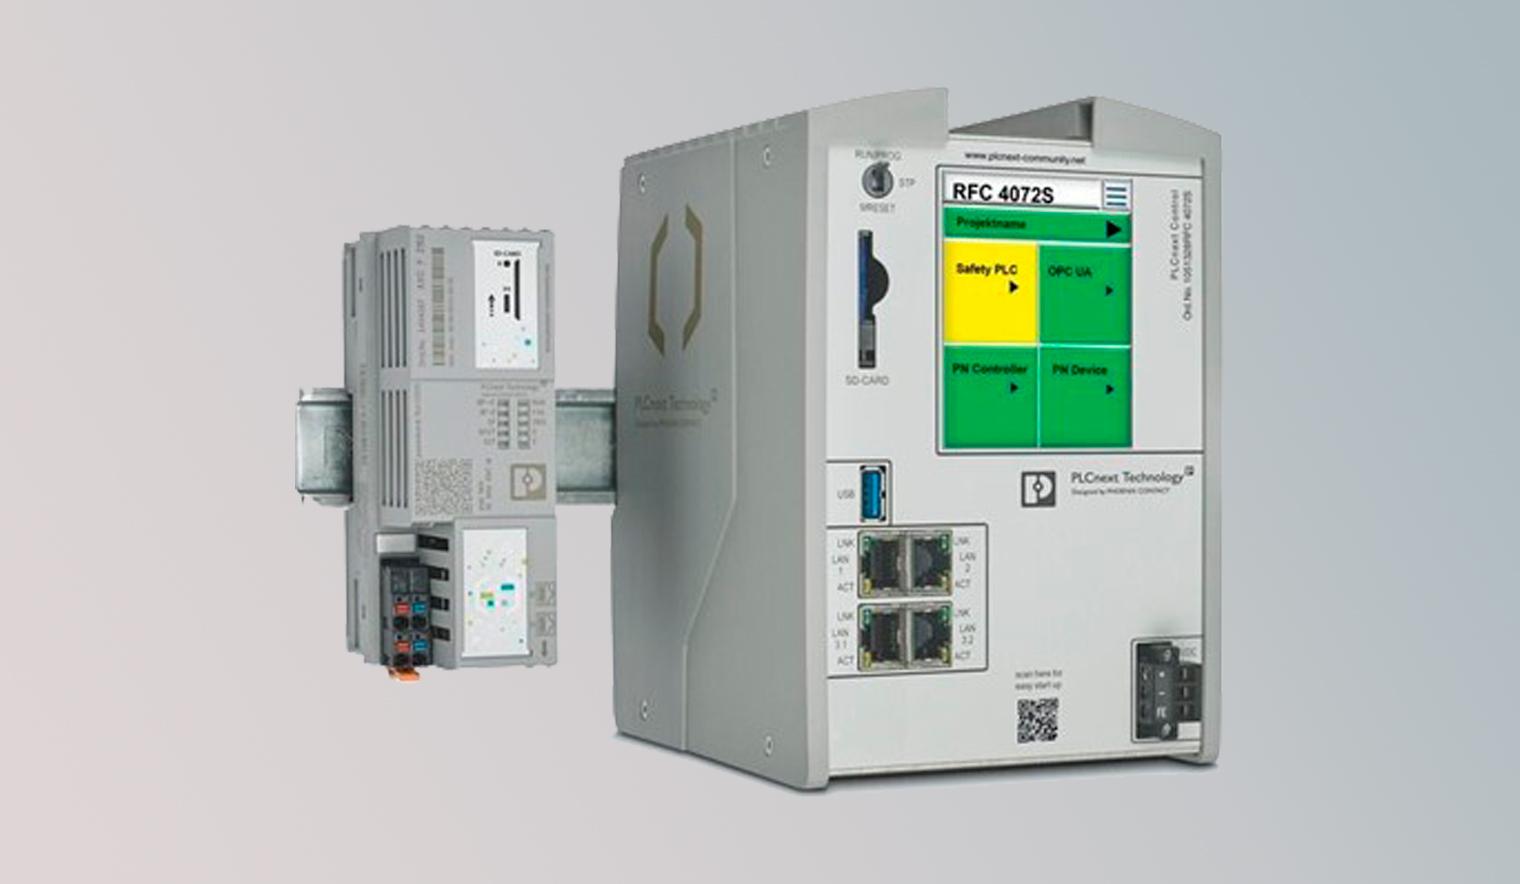 plc controls - PLCnext Control en dos clases de potencia